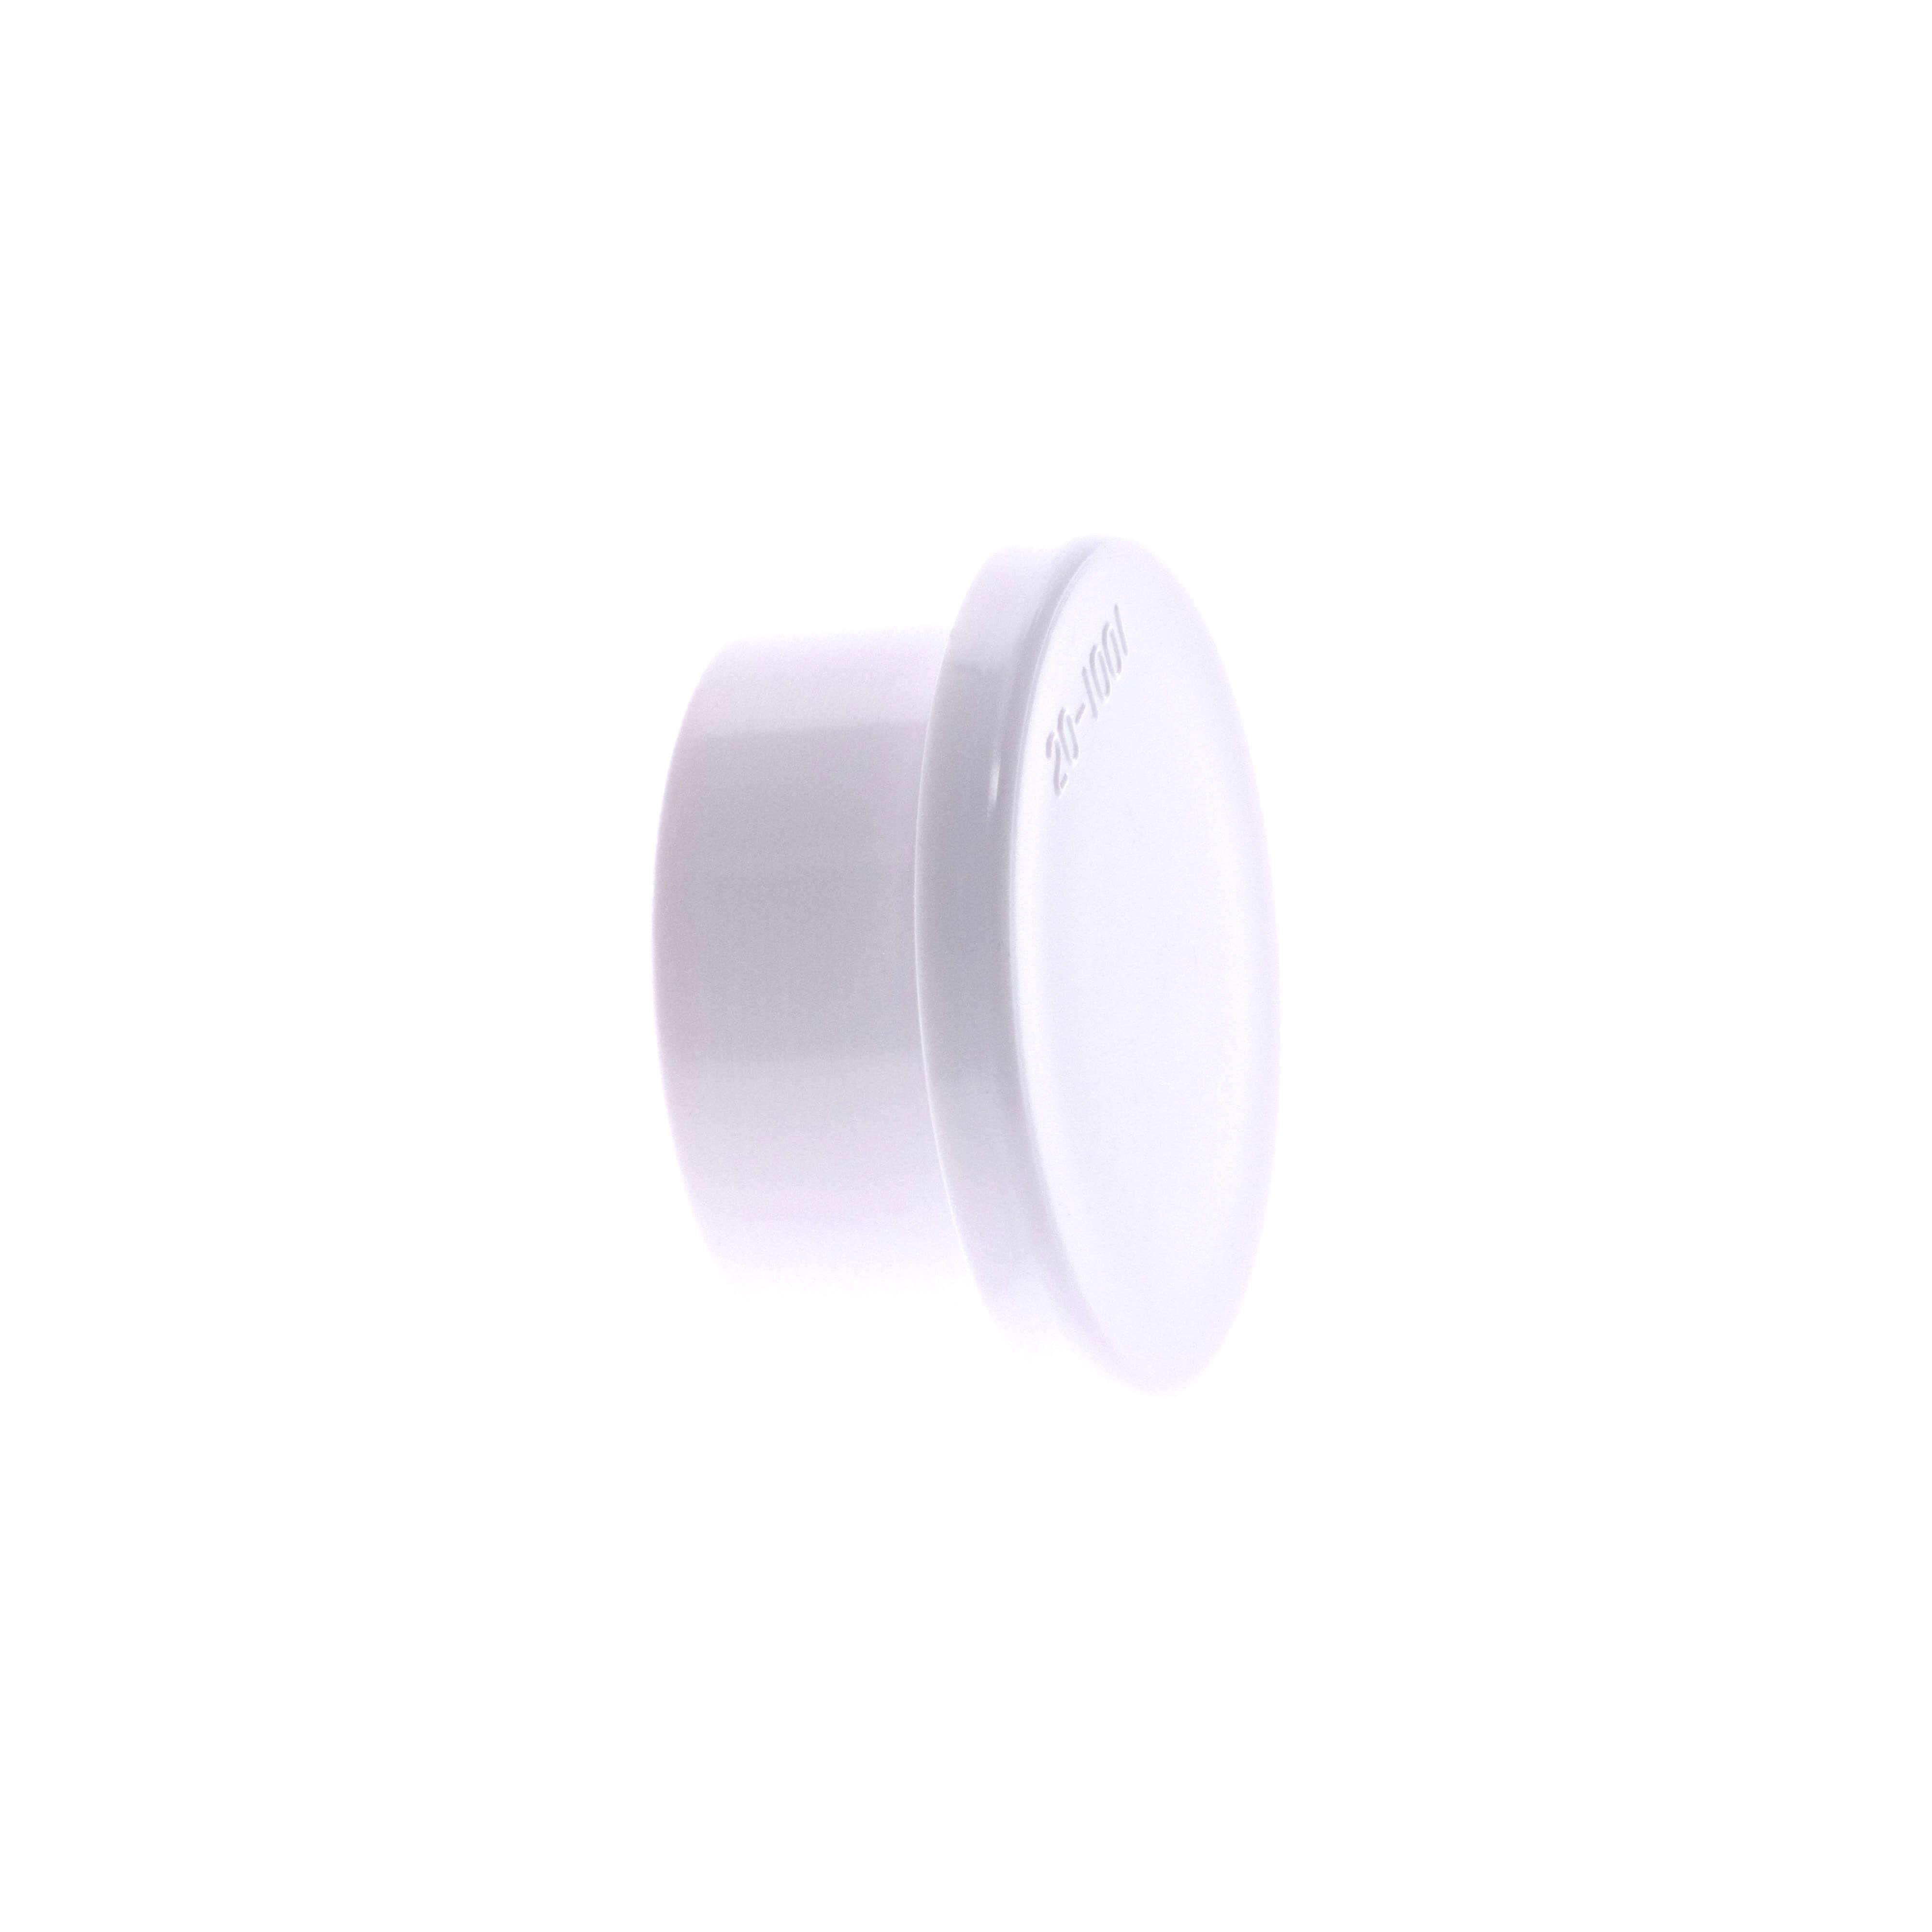 Bouchon M (32mm) tuyauterie ou nourrice